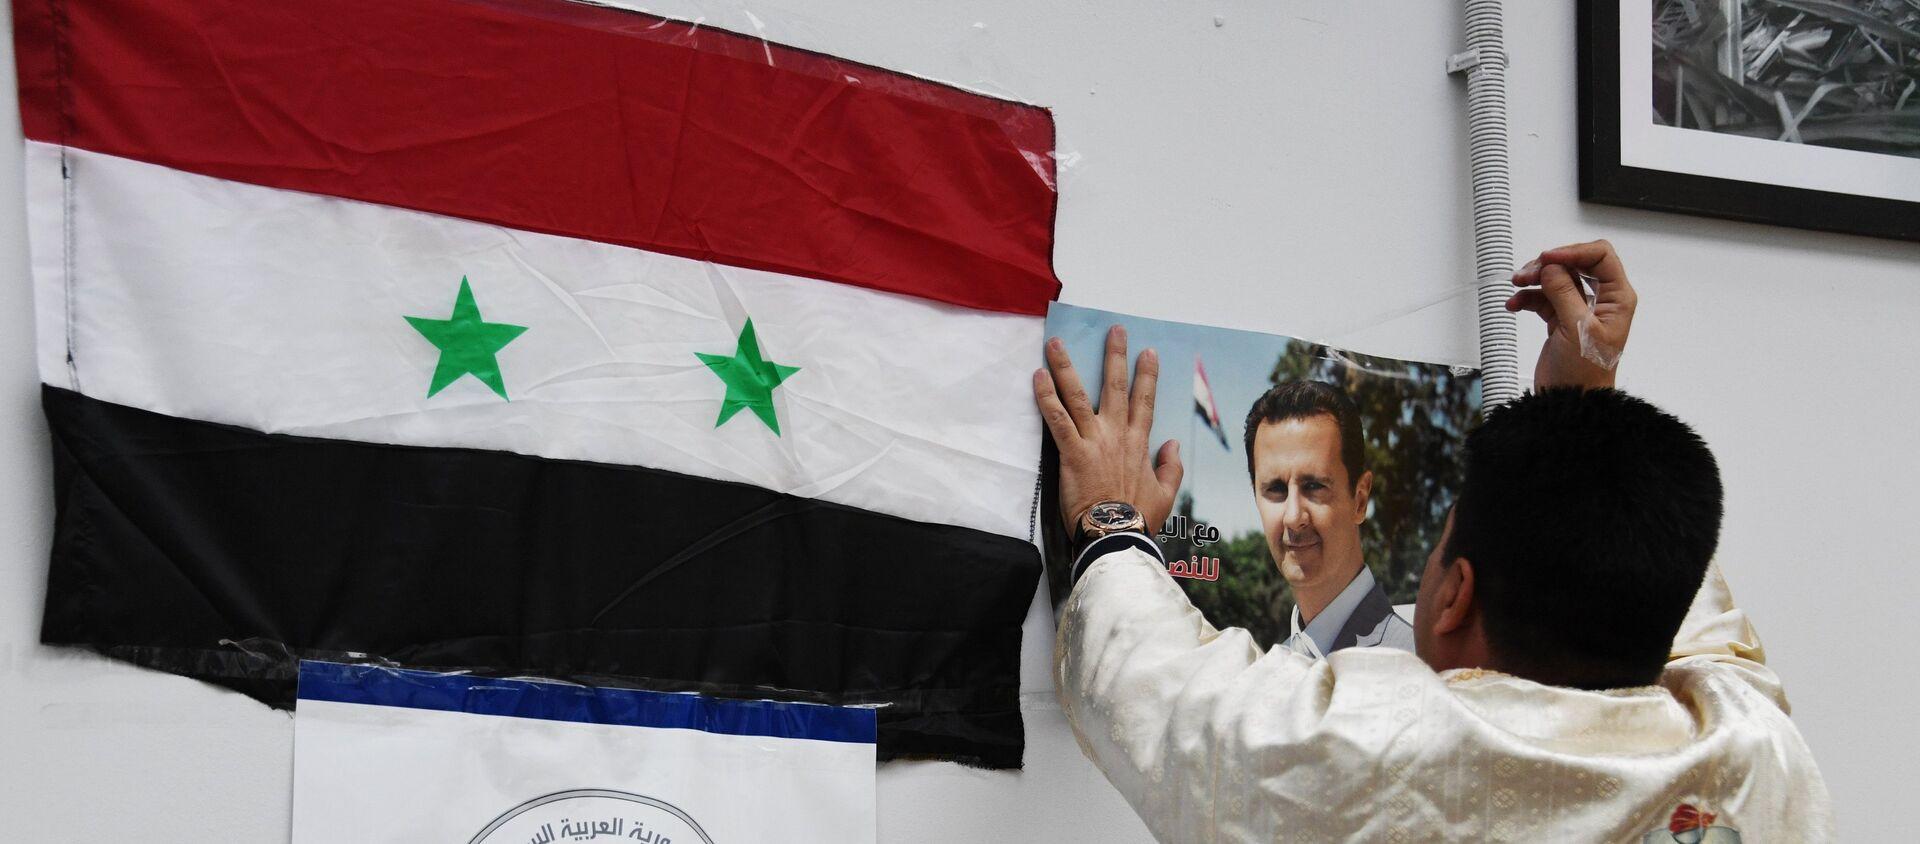 Флаг Сирийской Арабской Республики и портрет президента Башара Асада - Sputnik Армения, 1920, 23.04.2021